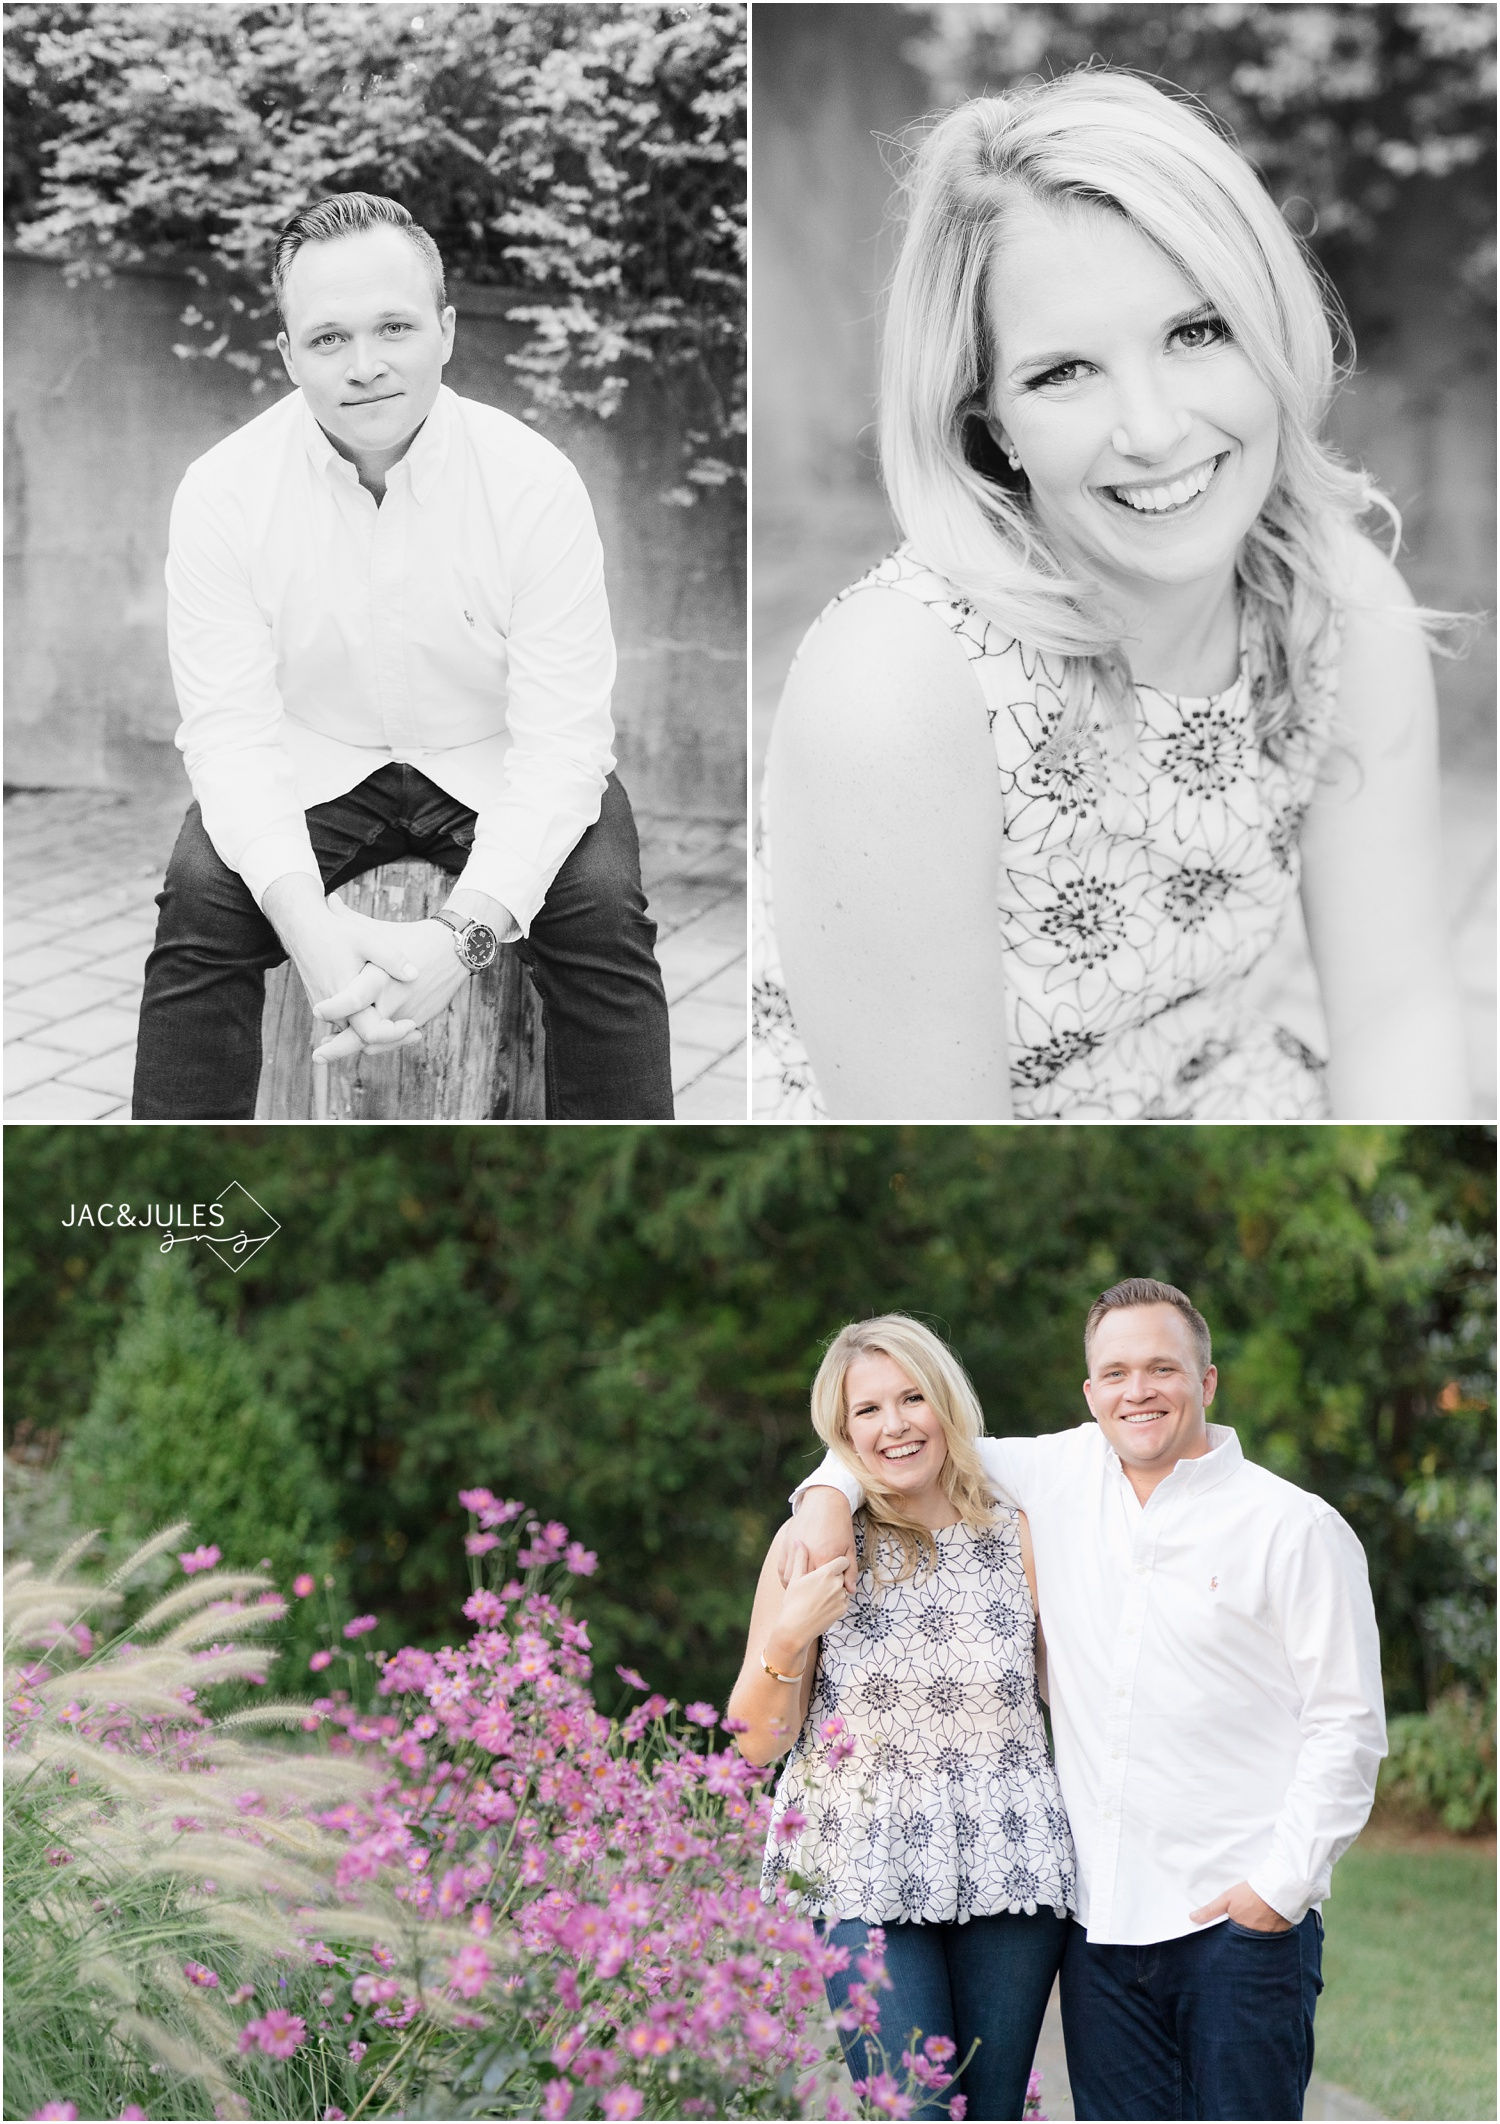 fun Engagement photos at Van Vleck House and Gardens in Montclair, NJ.